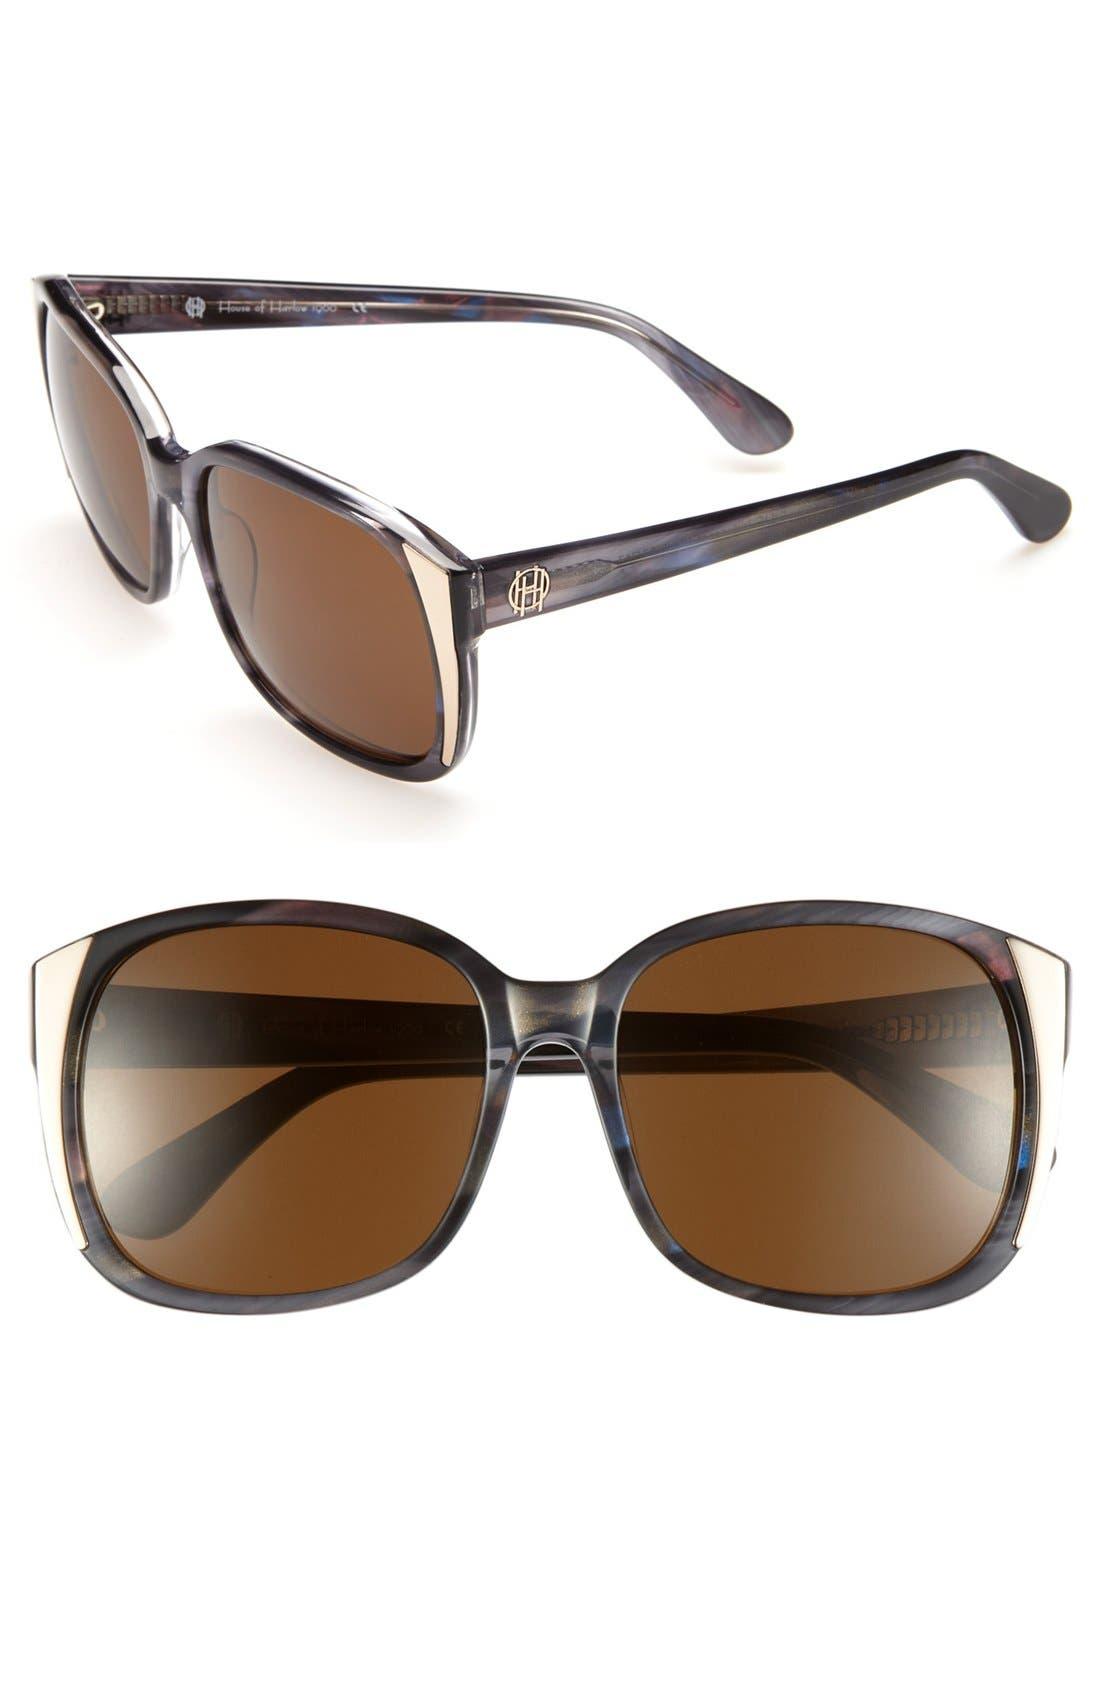 Main Image - House of Harlow 1960 'Julie' 57mm Oversized Sunglasses